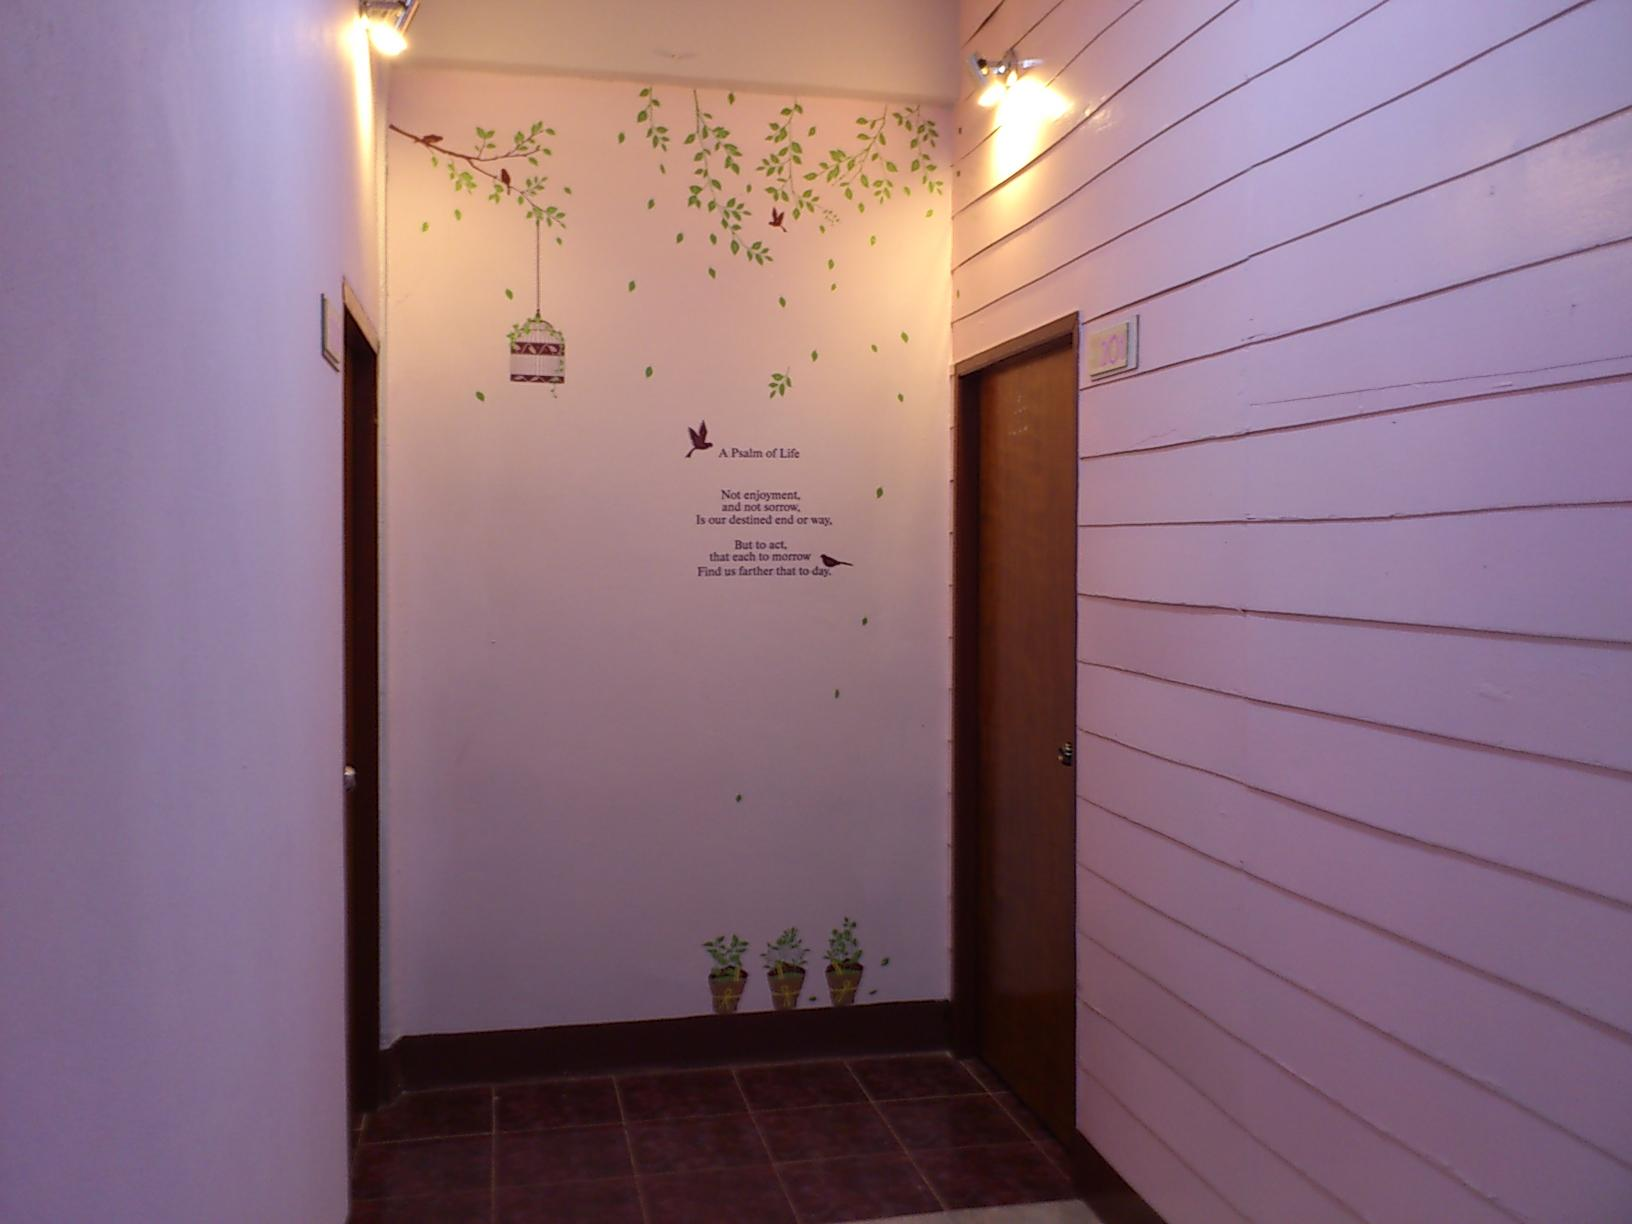 Baan Saen Rak Apartment and Exclusive Hostel, Muang Phatthalung